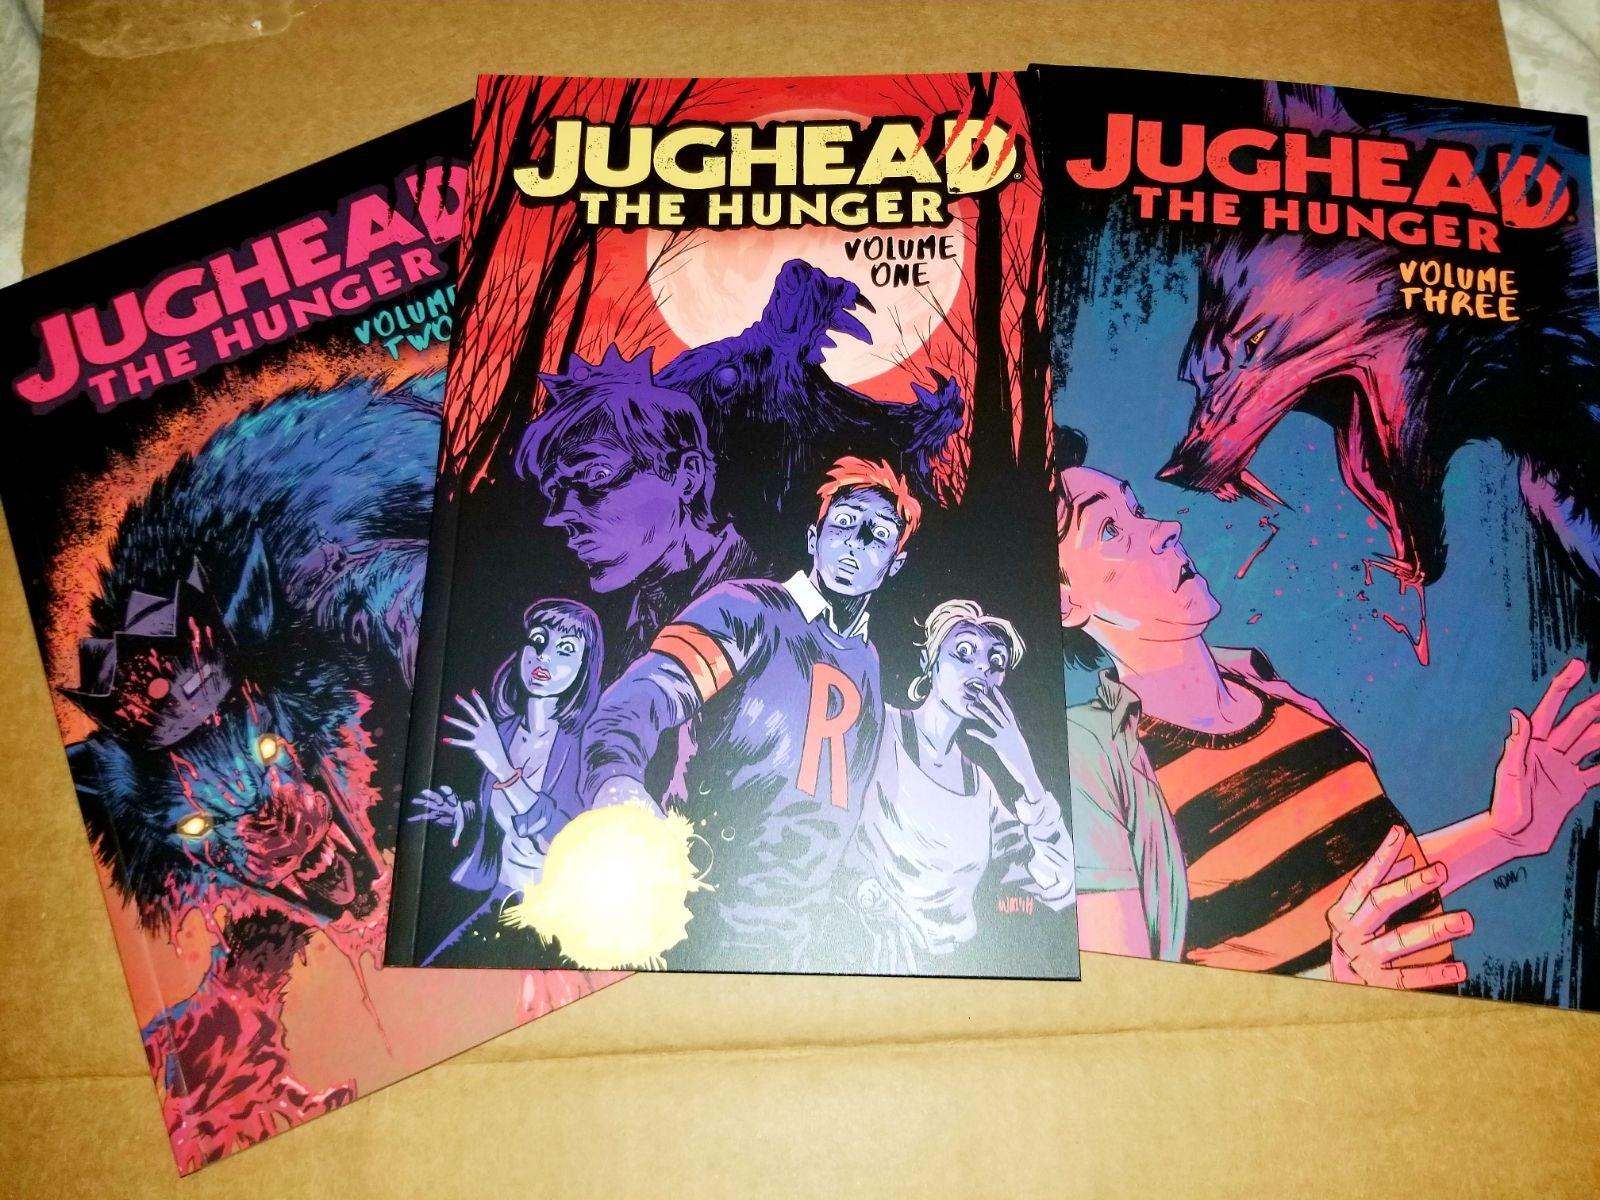 Jughead: The Hunger Vol. 1-3 ($60+value)